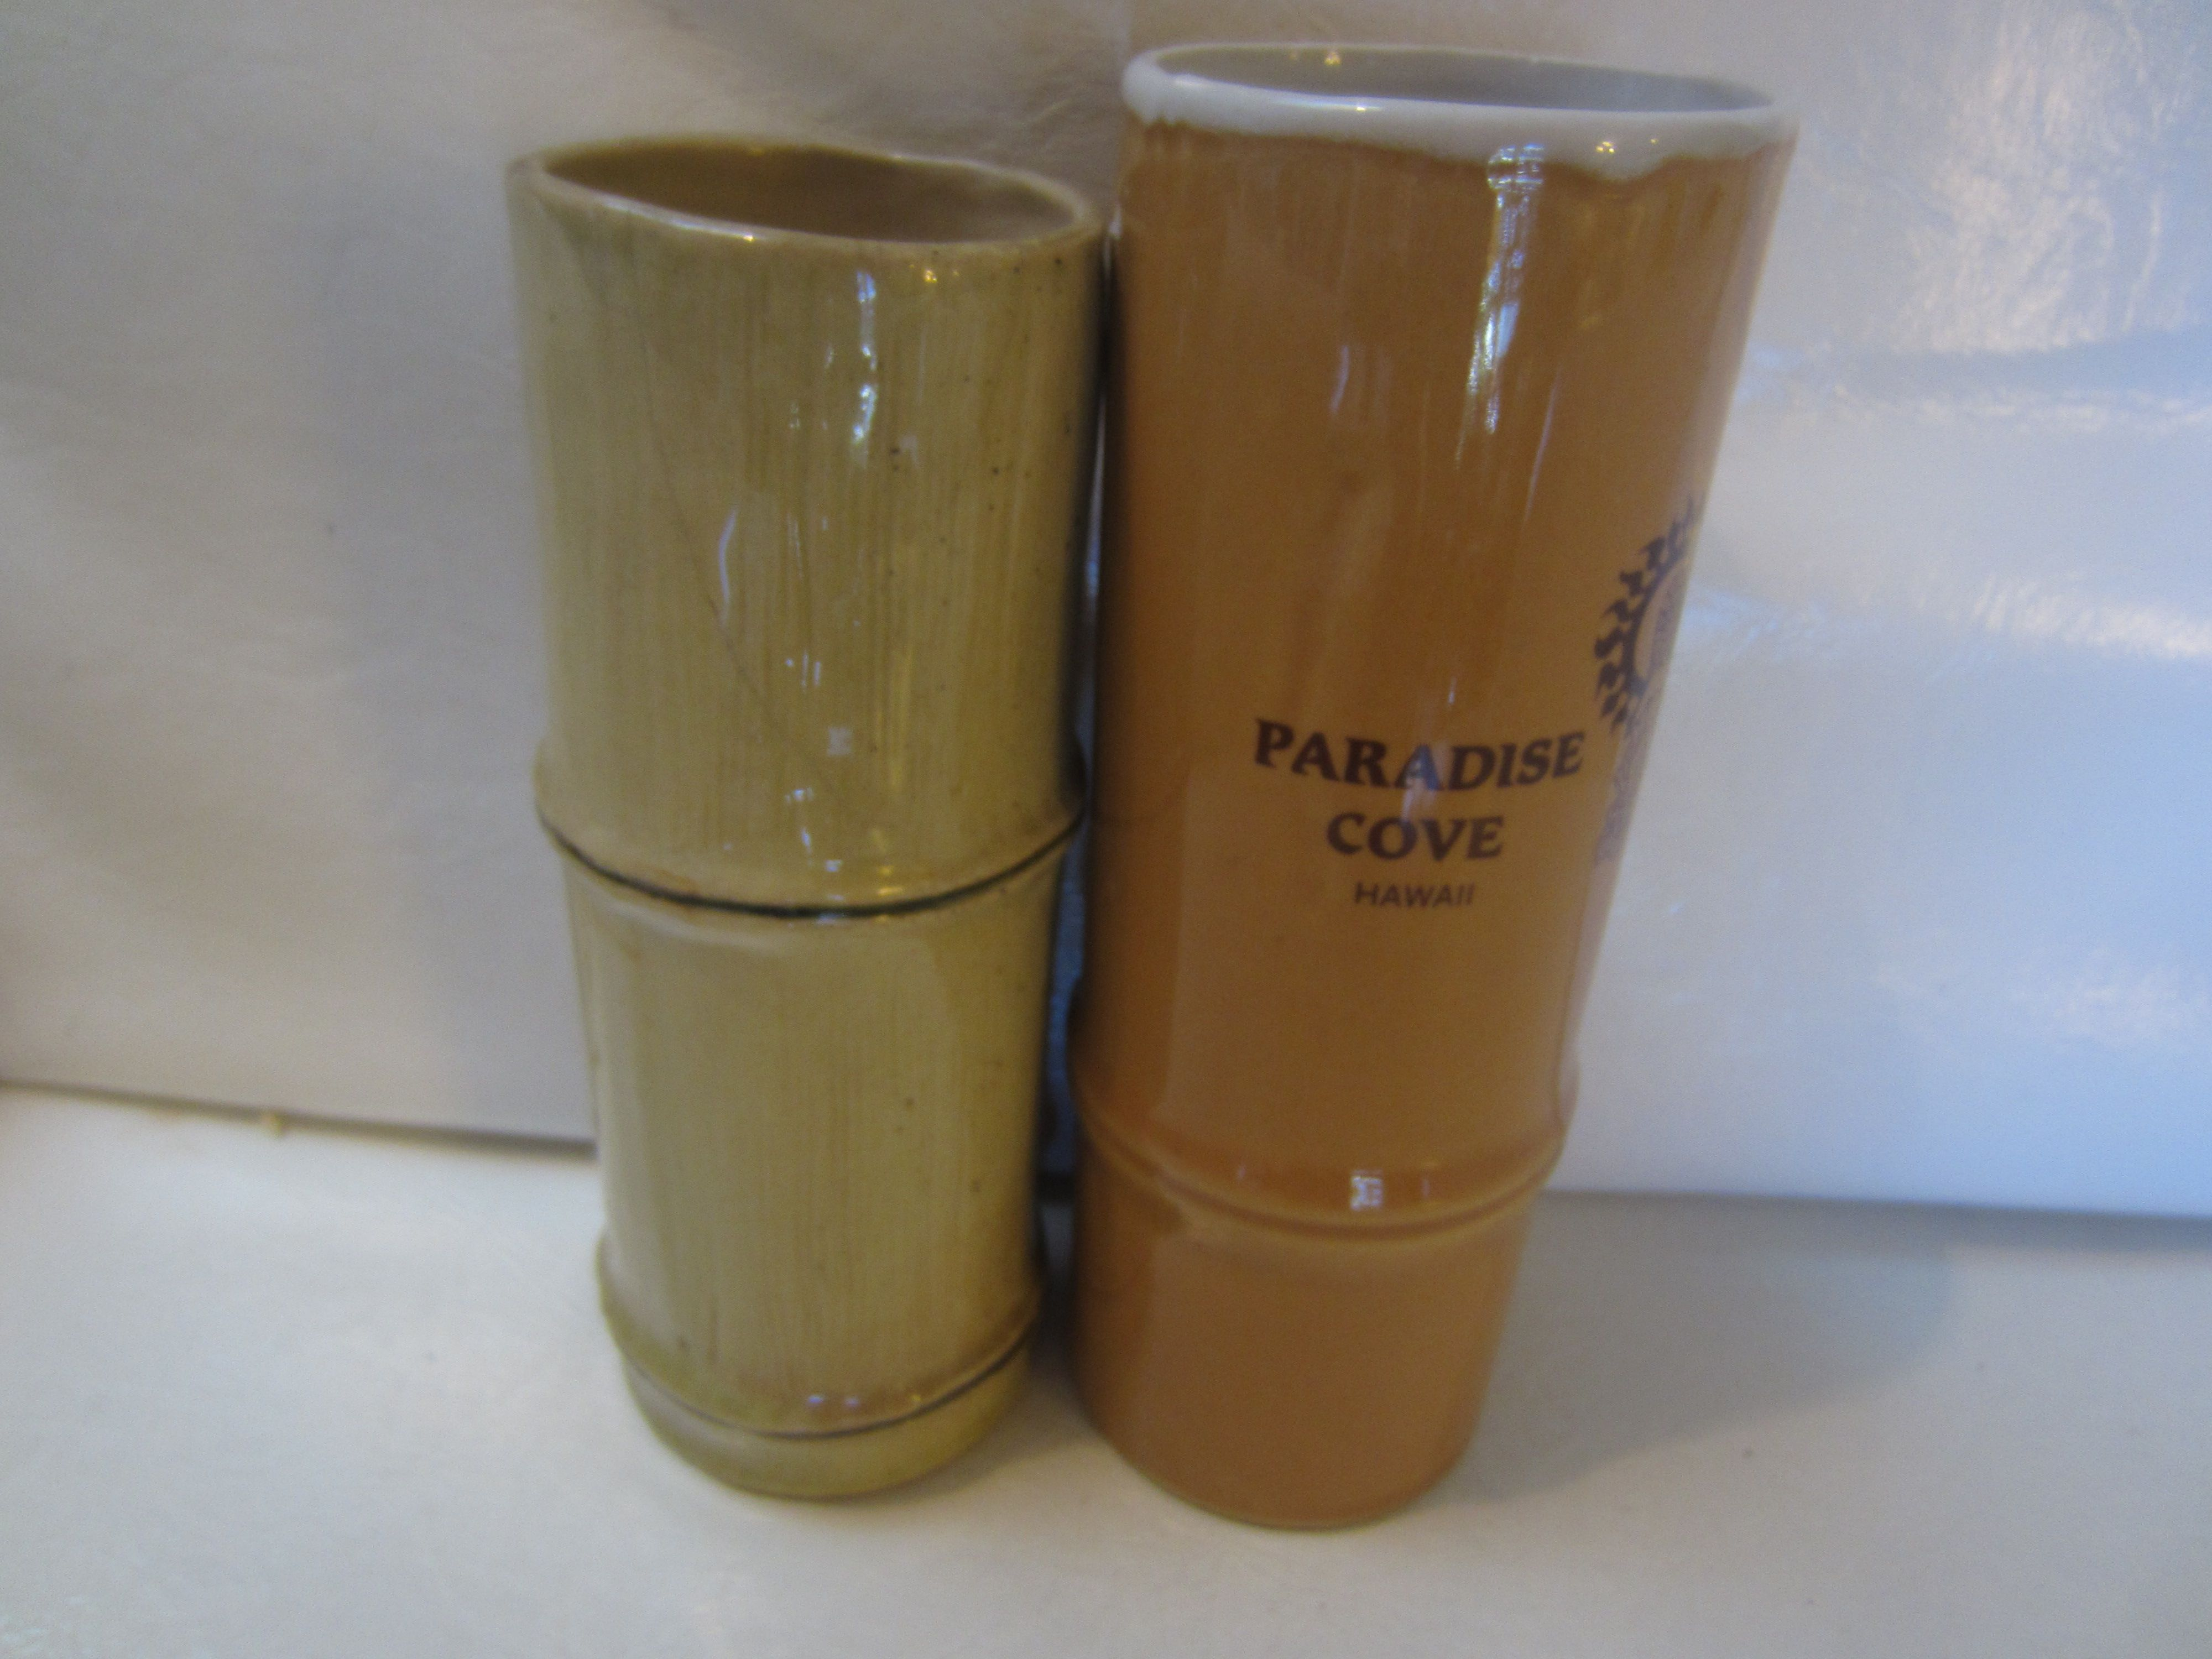 vintage PMP PAUL MARSHALL BAMBOO STYLE TIKI MUG vintage 1961 kitschy souvenir (crack)